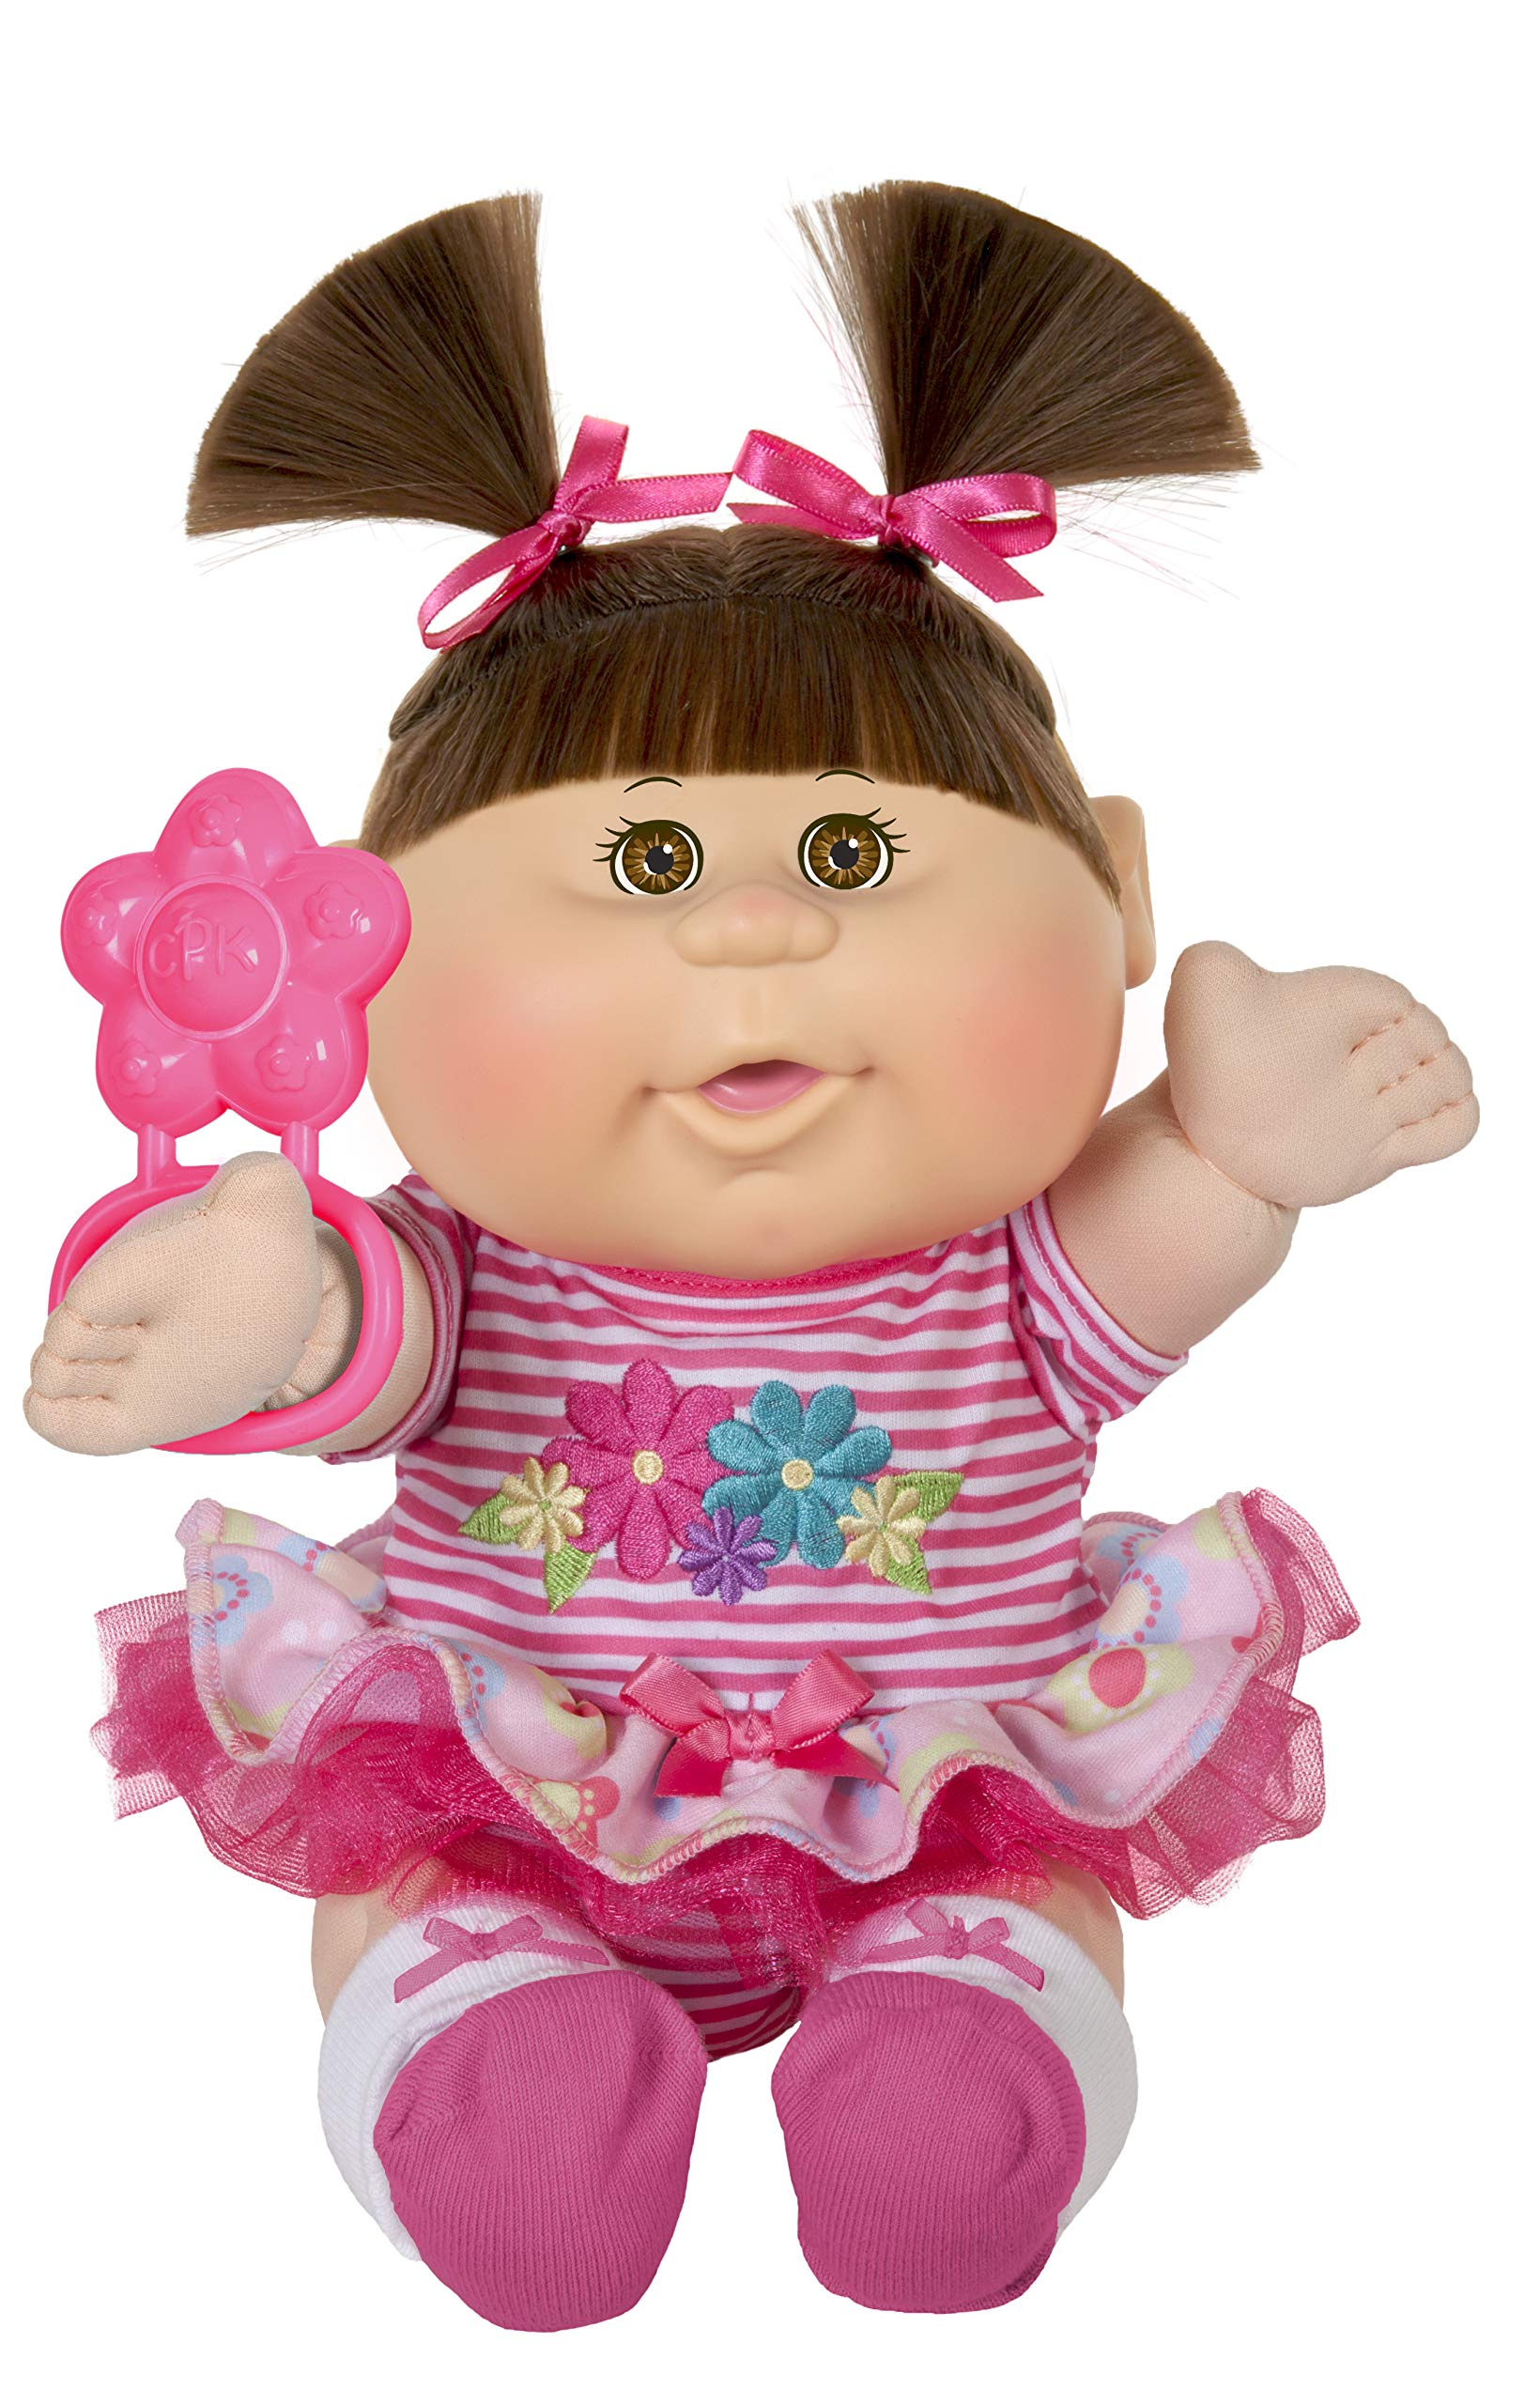 "Cabbage Patch Kids 12.5"" Playtime Brunette Baby Ruffle Skirt, Multi, Model:30332b"